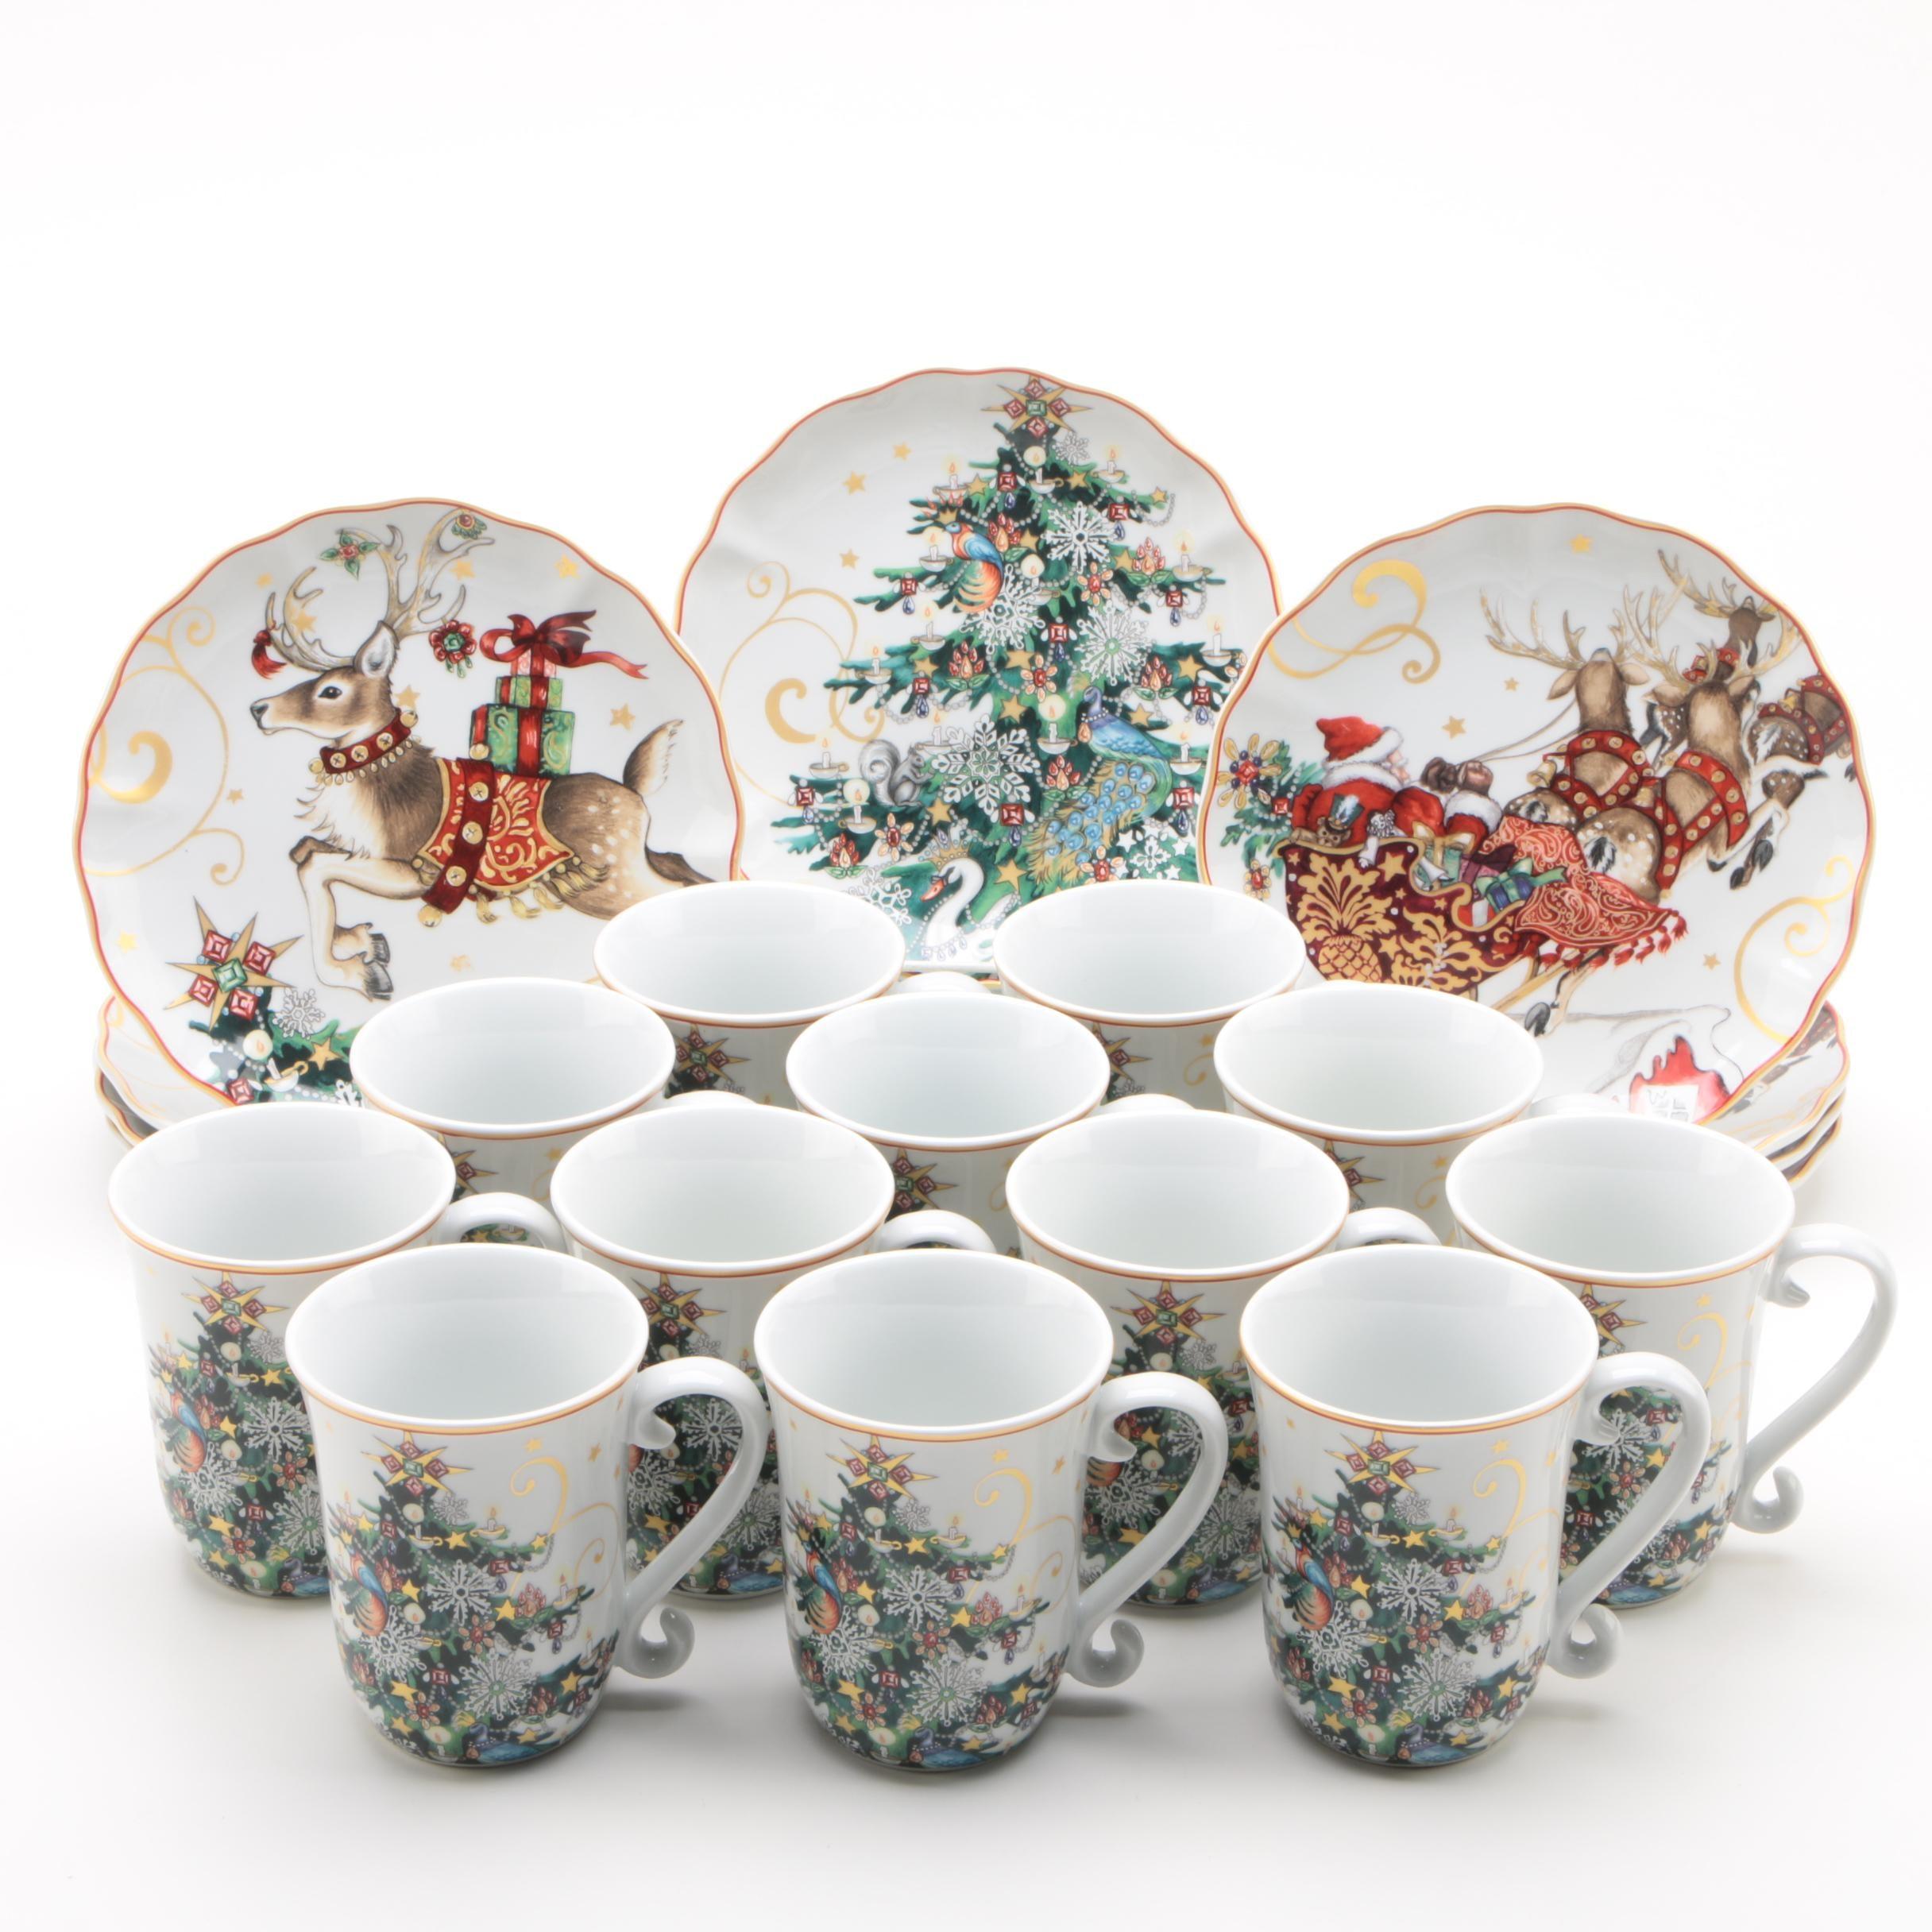 Williams-Sonoma Christmas Themed Plates and Mugs